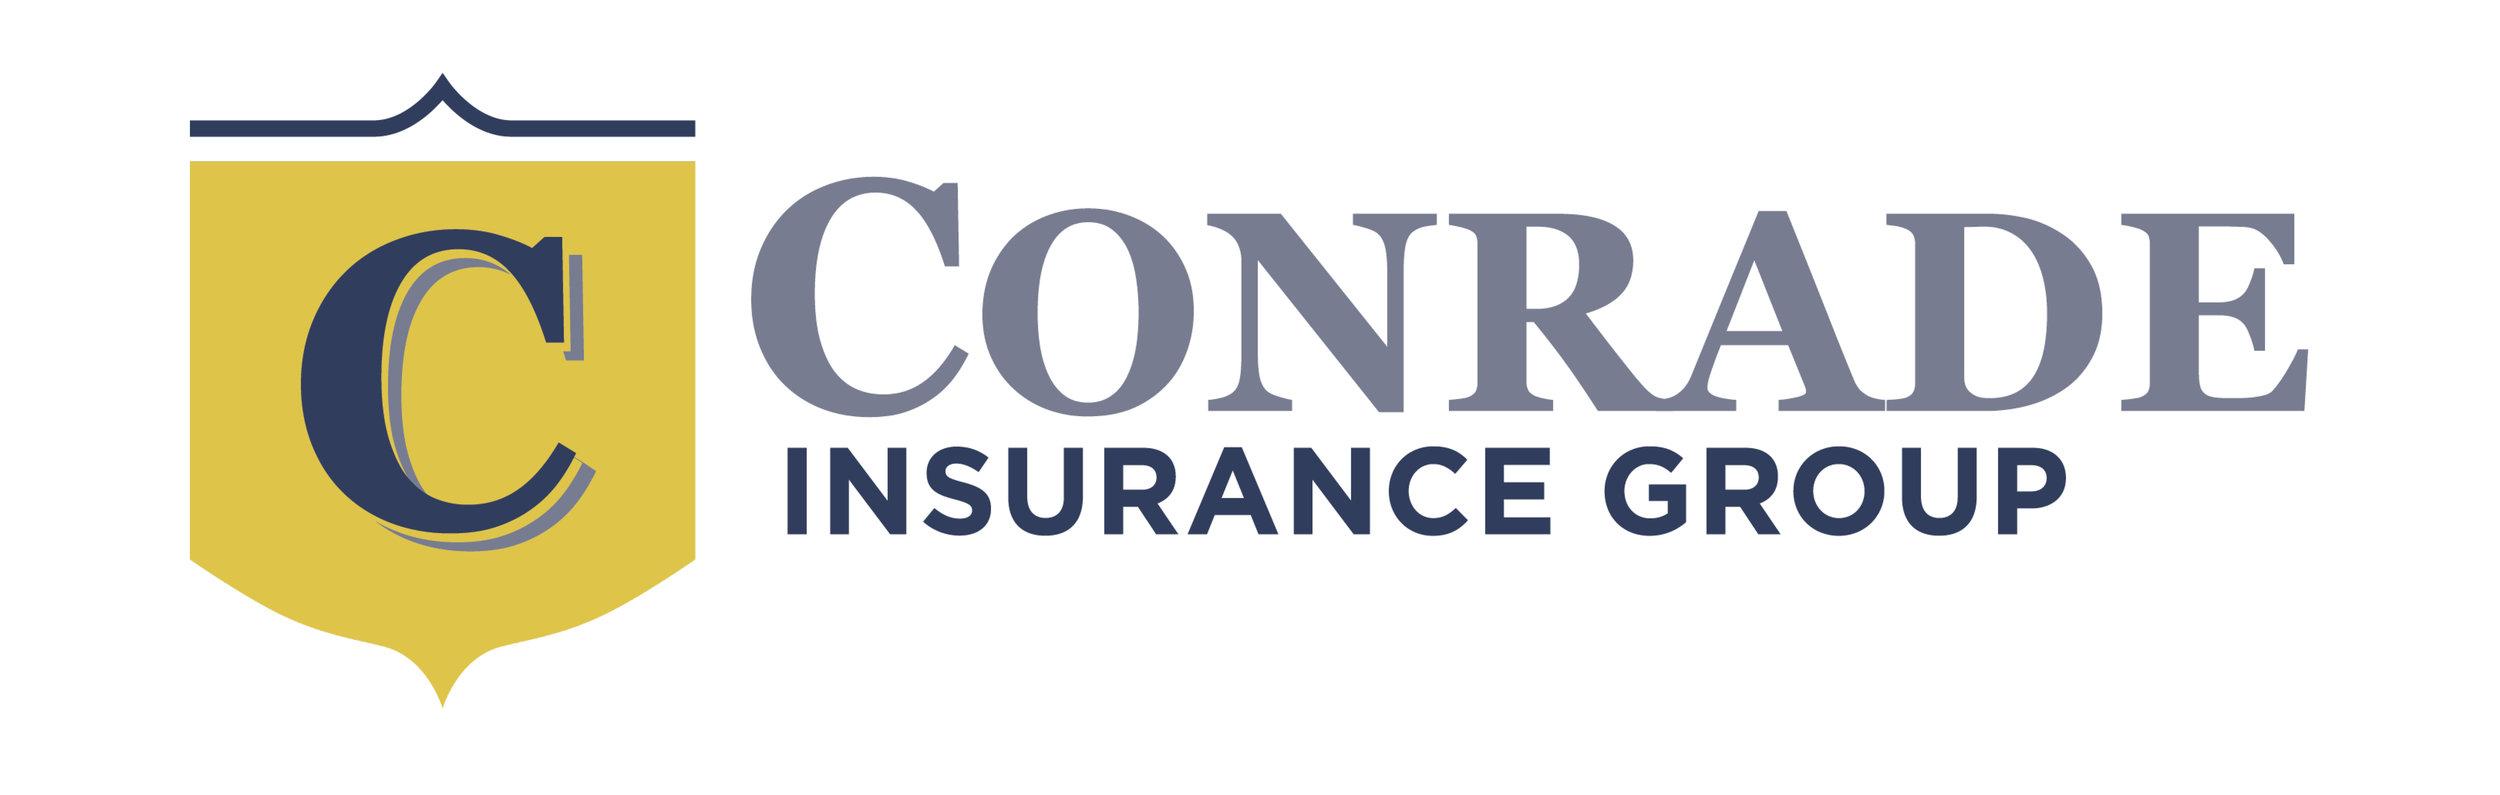 Conrade Insurance Logo - Web.jpg